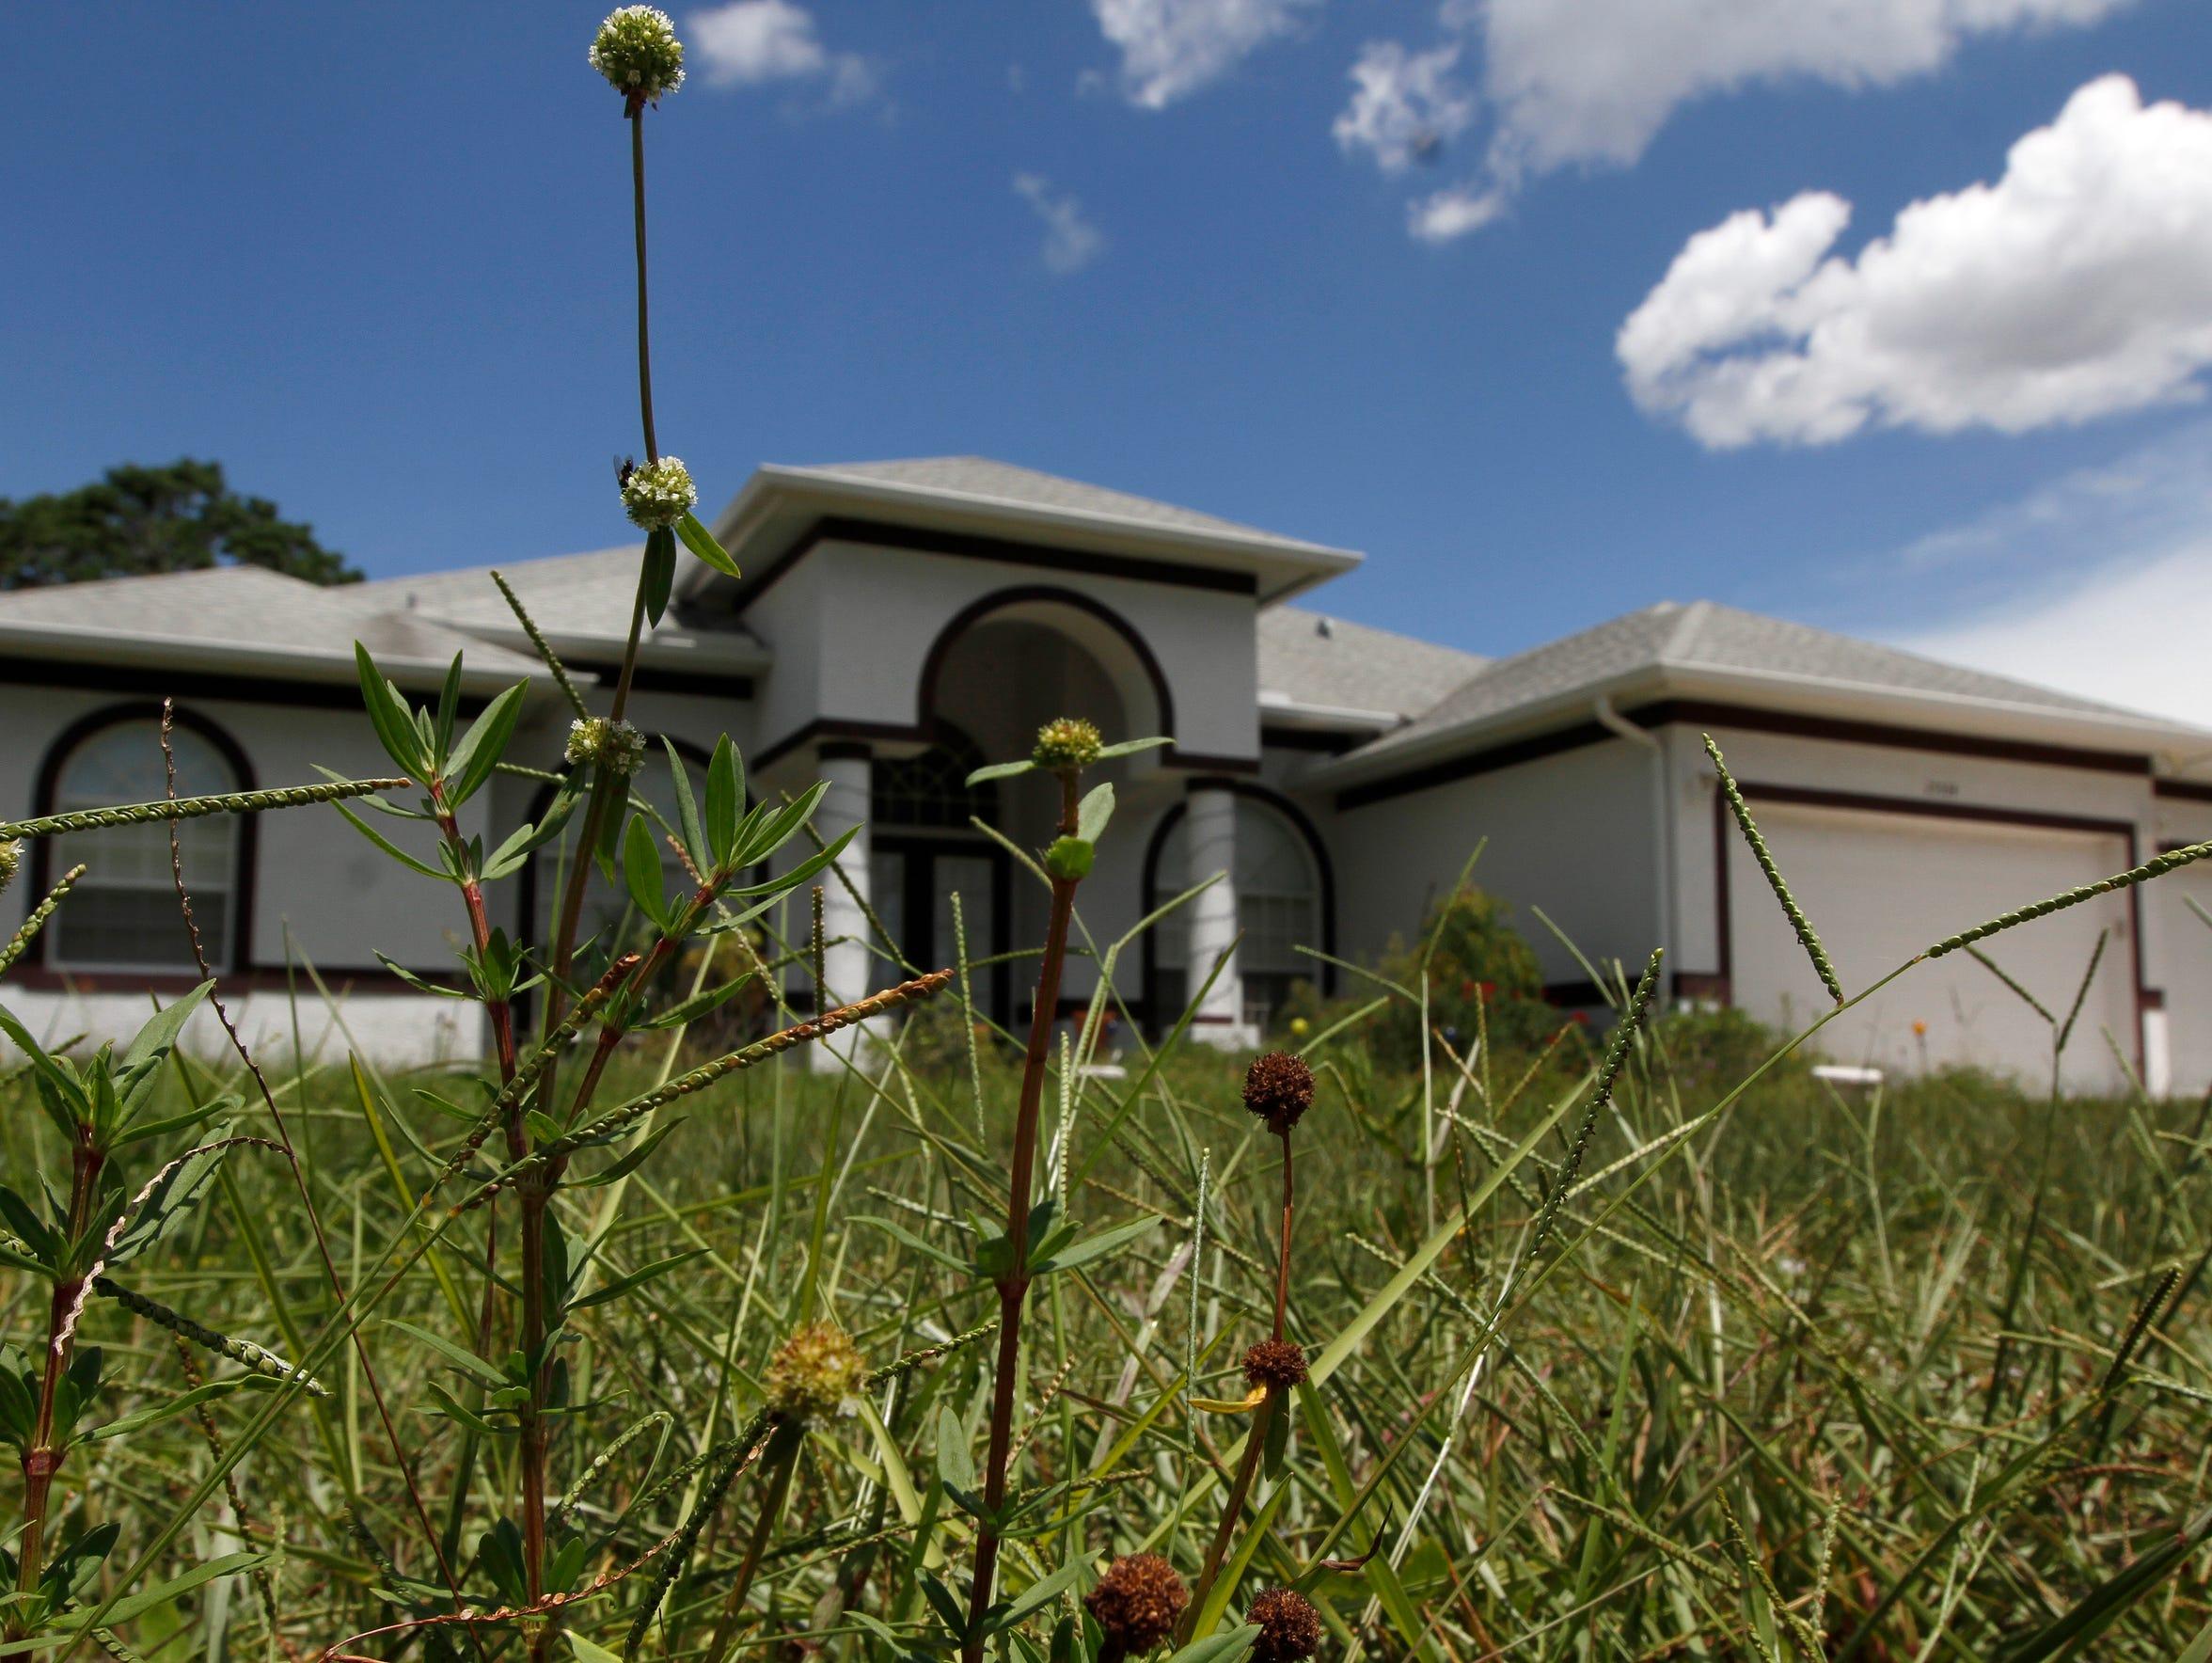 The Bonita Springs home of Mark and Teresa Sievers